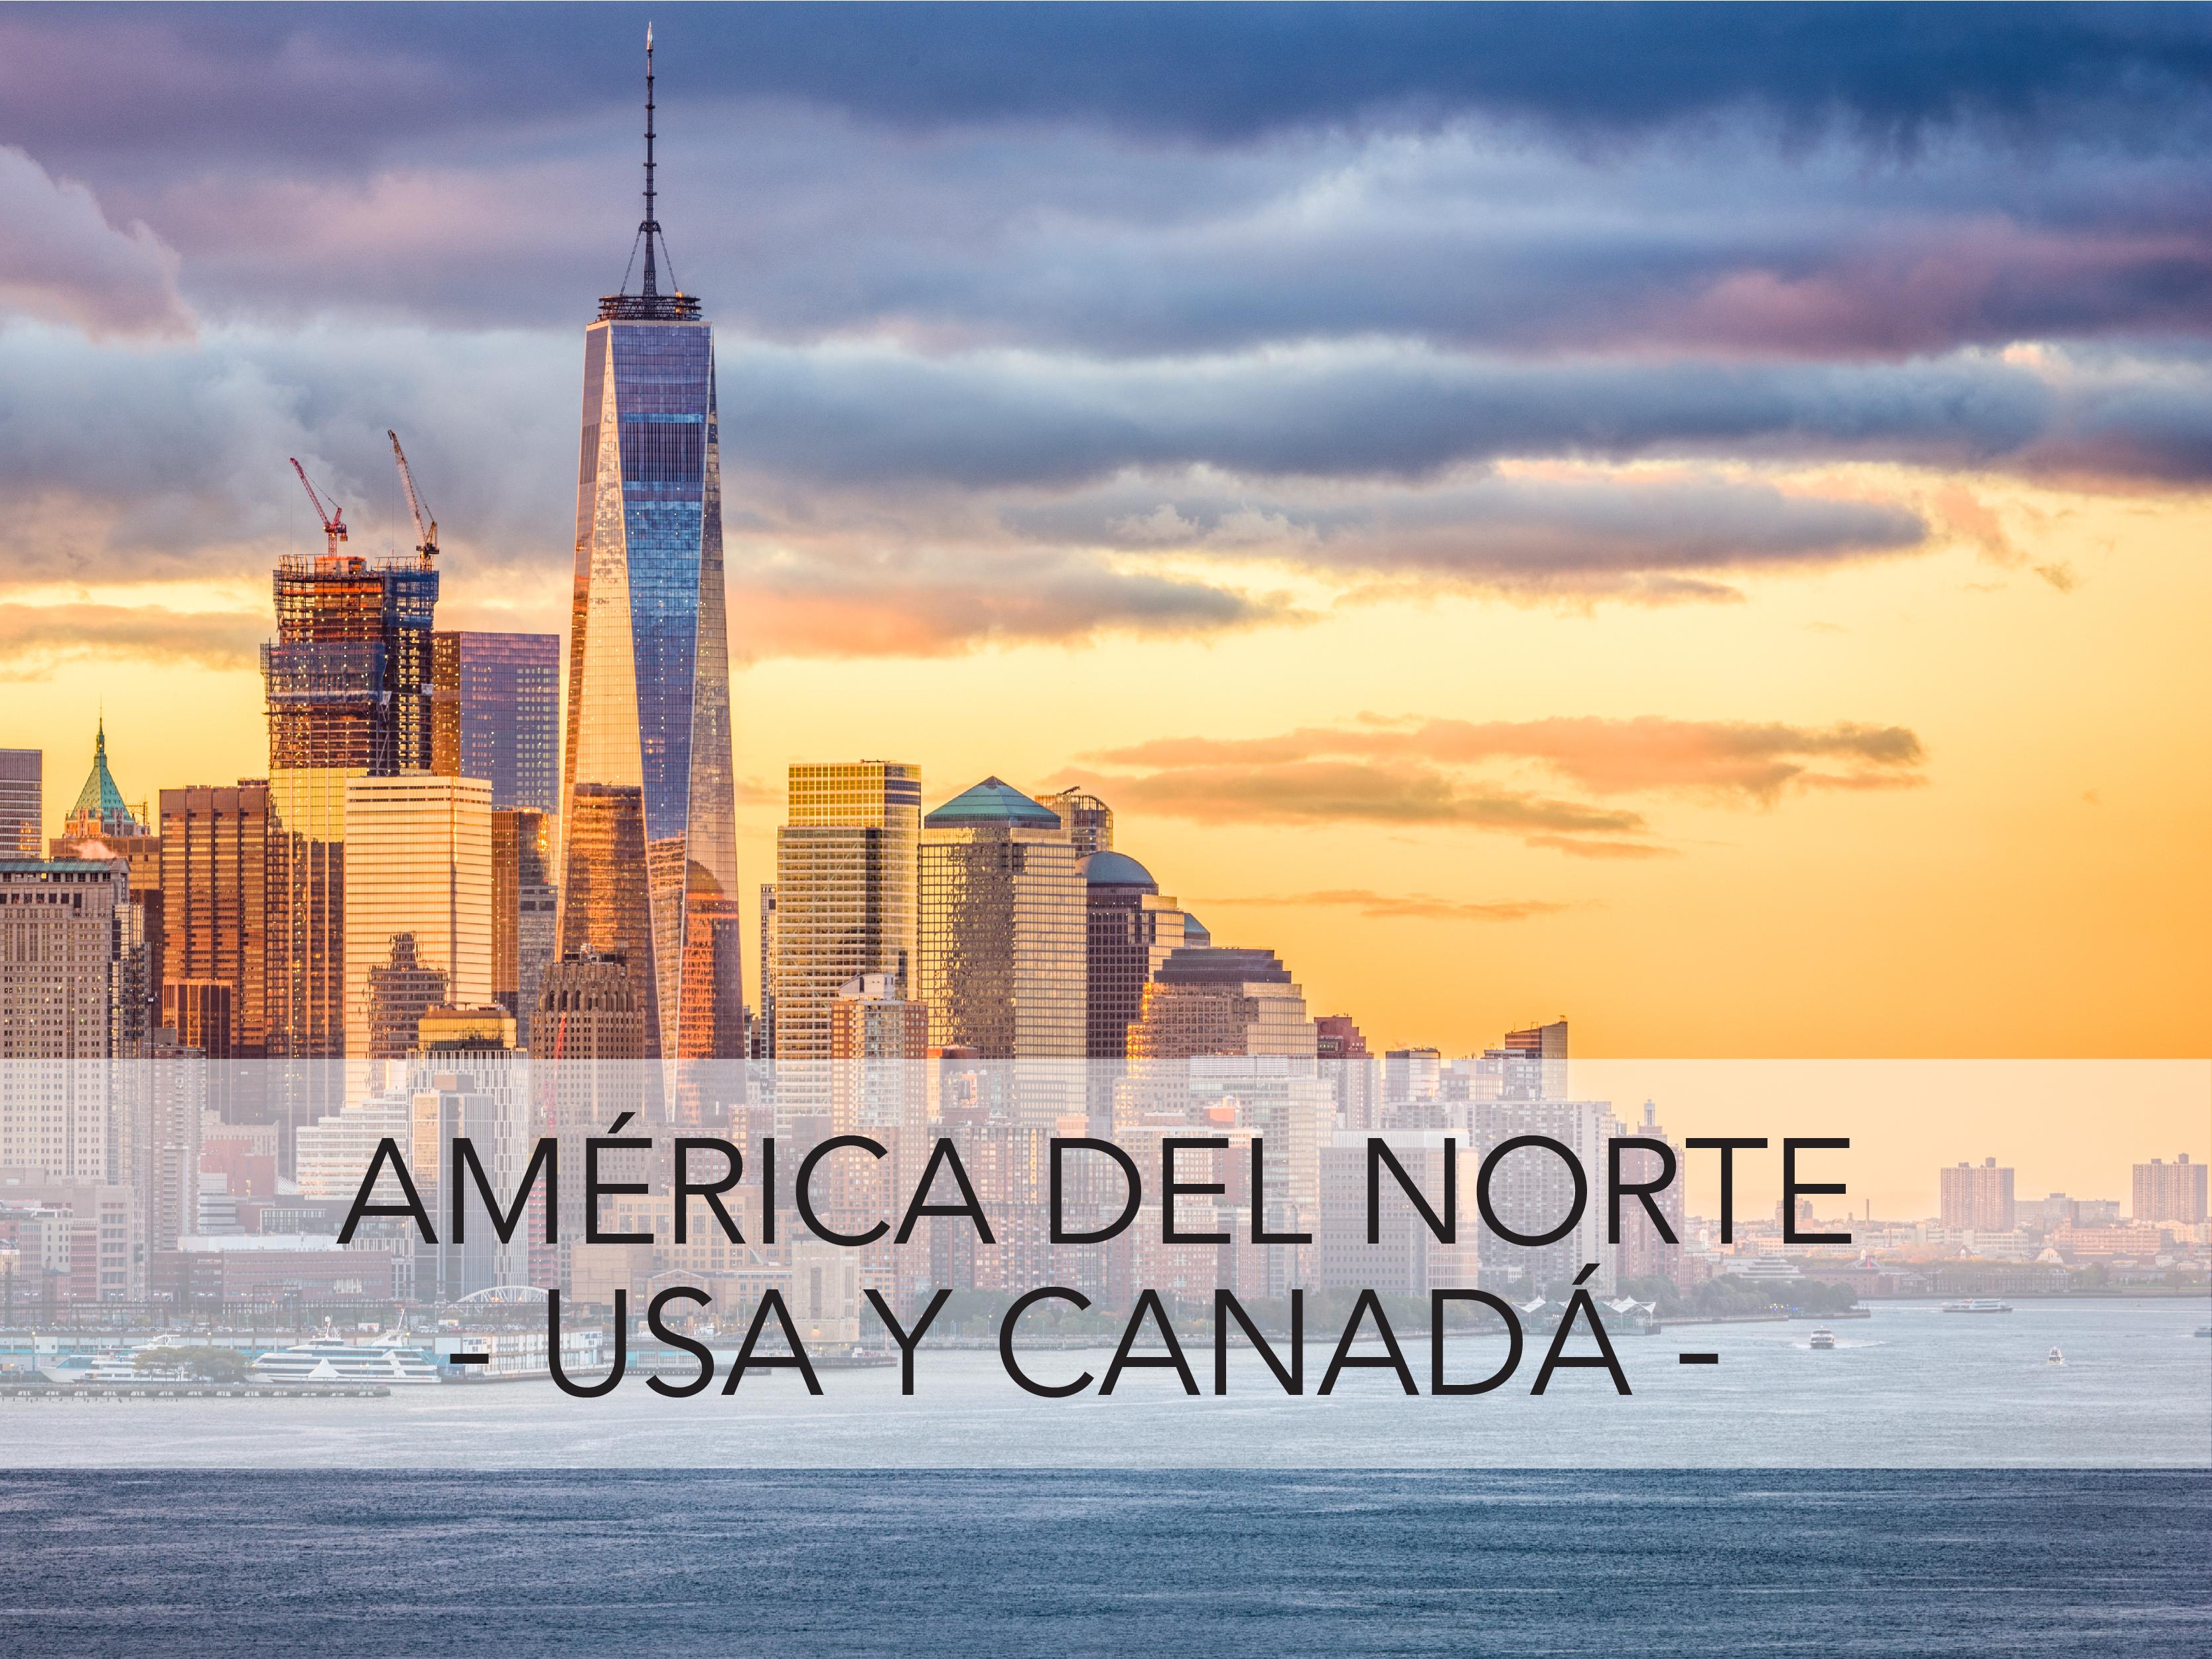 alt= América del Norte Fiesta Tour USA y Canadá